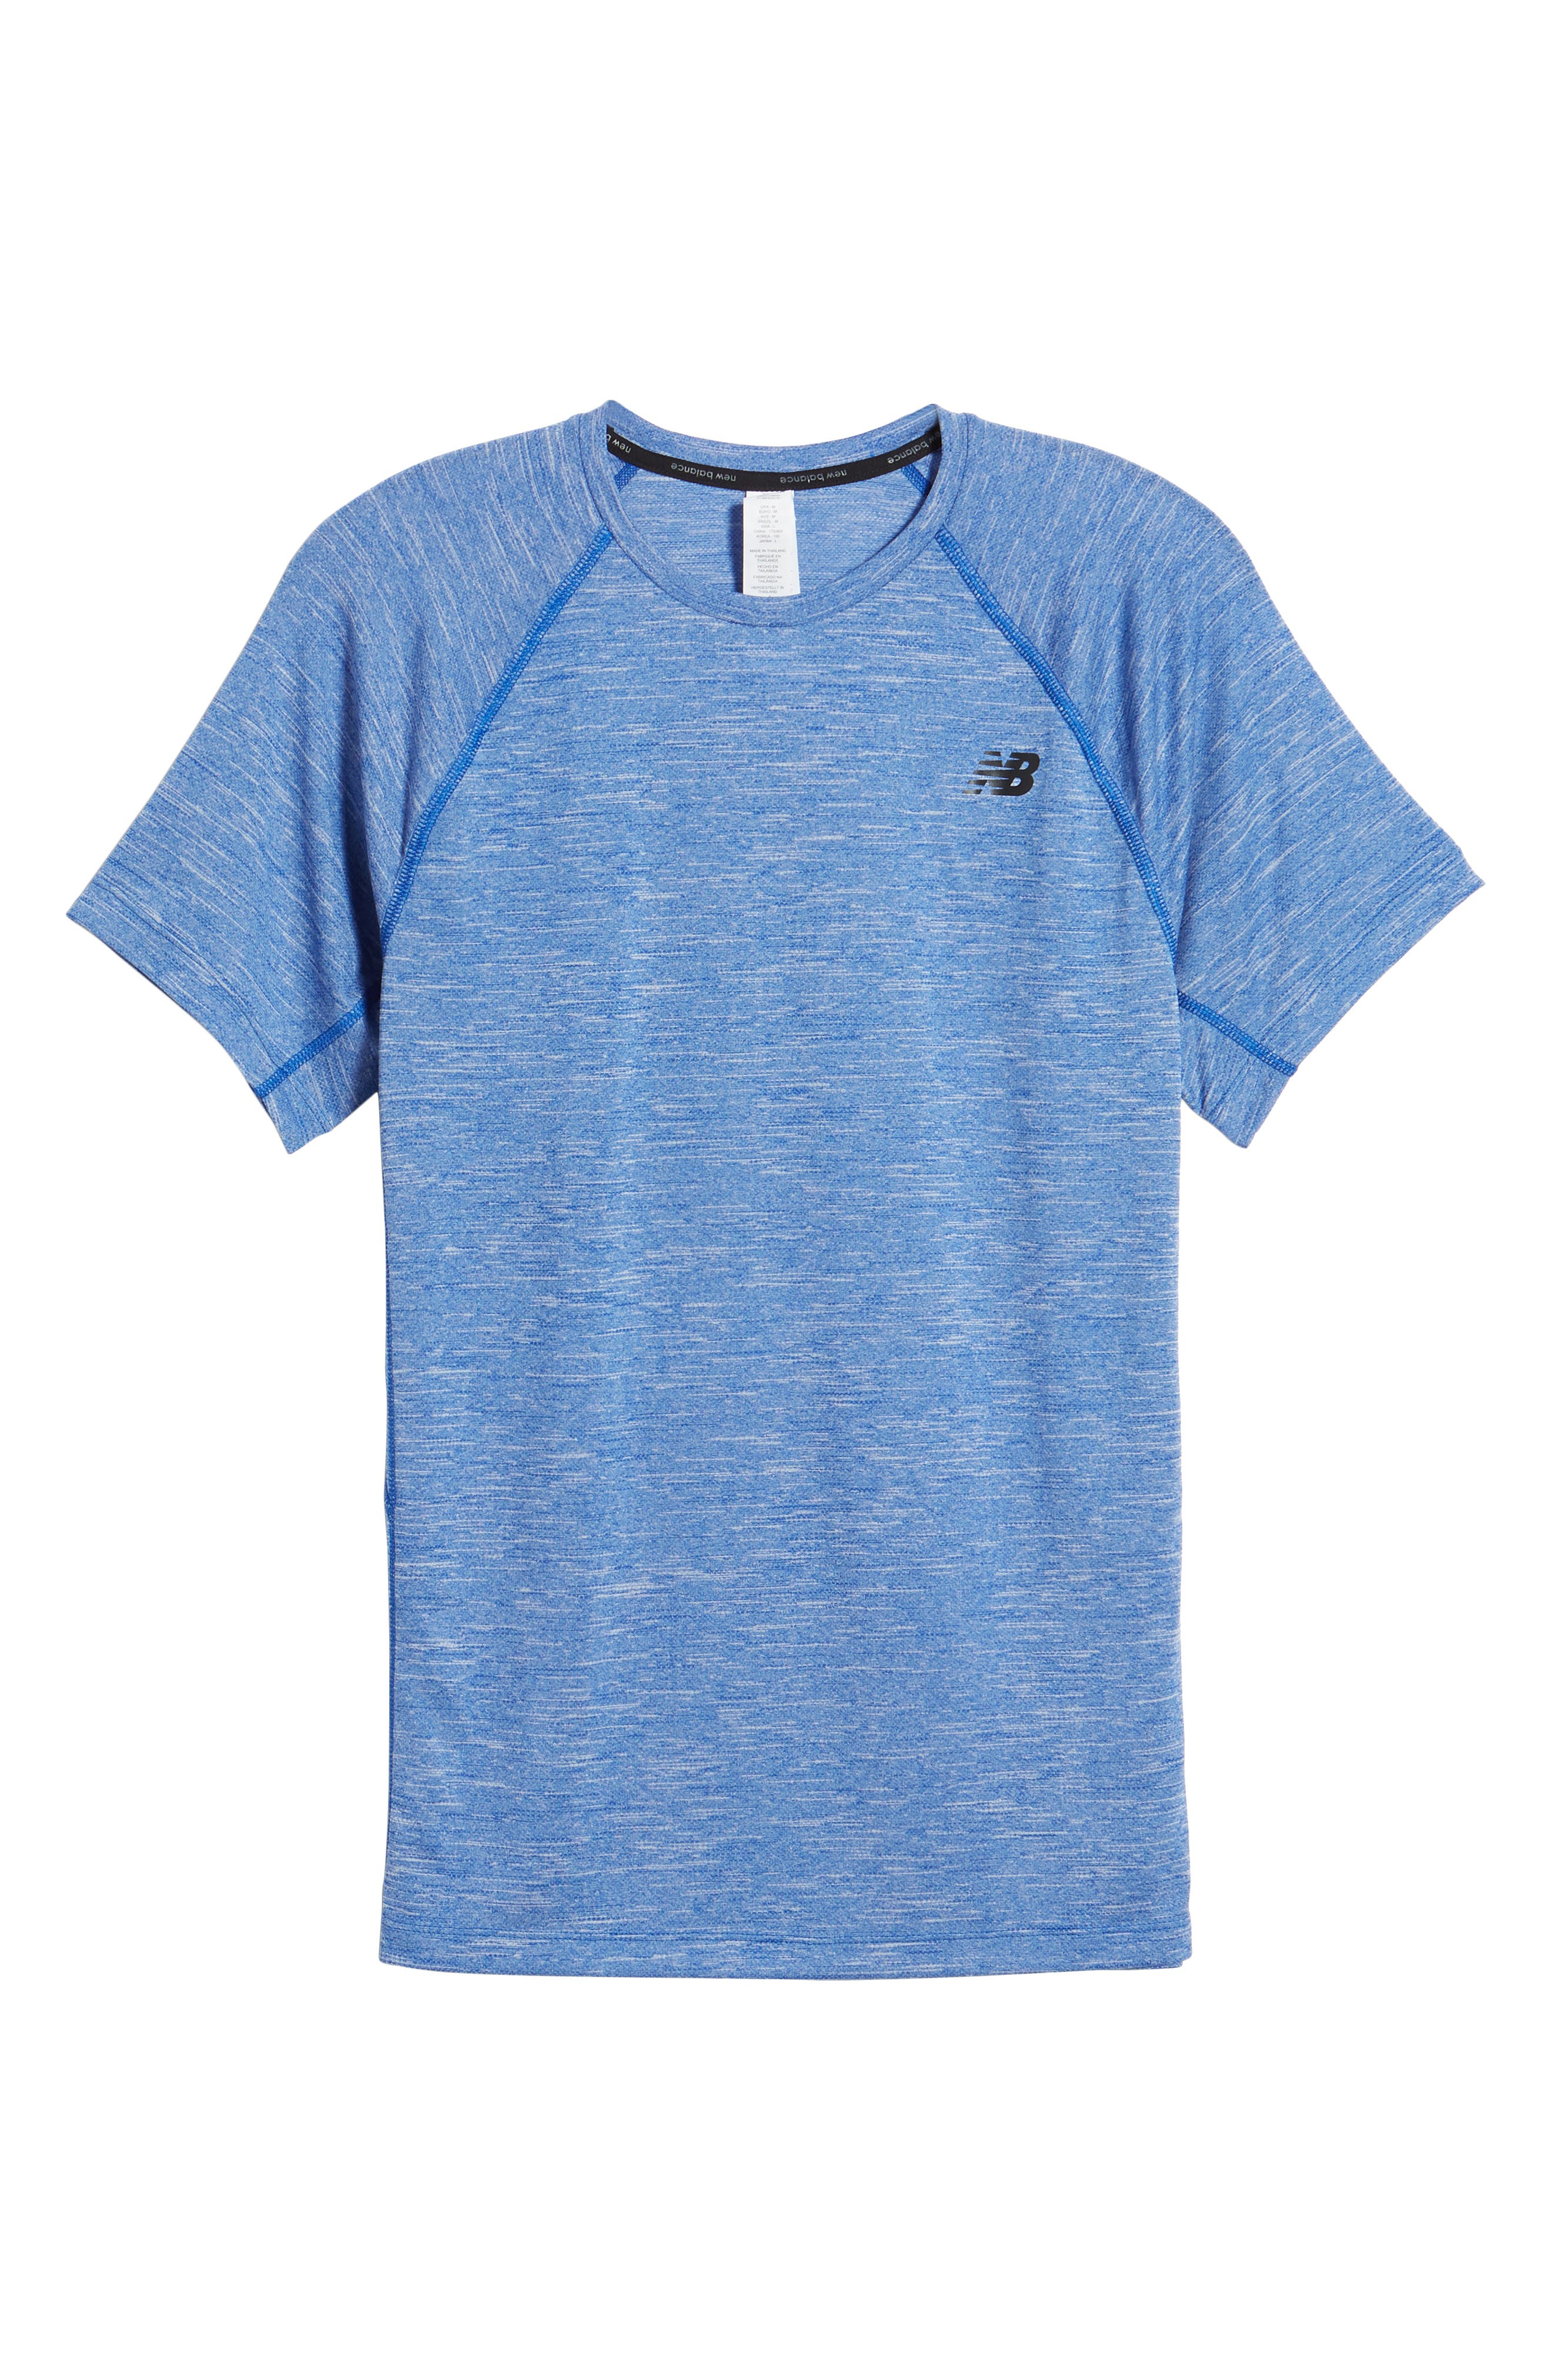 Tenacity Crewneck T-Shirt,                             Alternate thumbnail 6, color,                             Team Royal